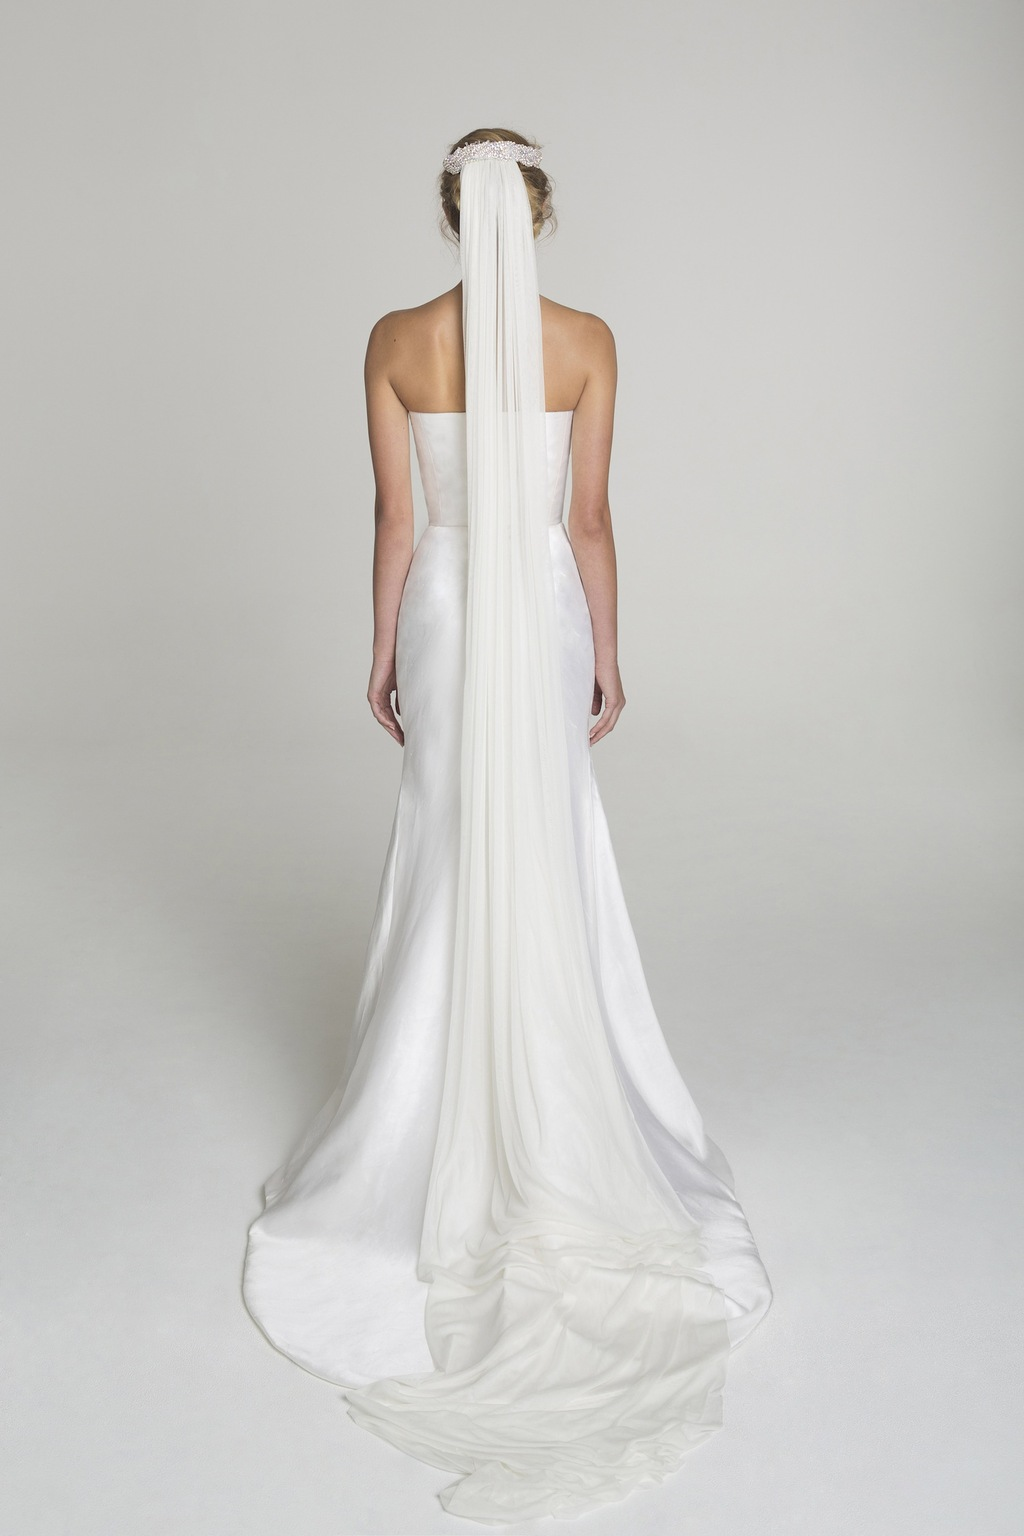 Strapless_wedding_dress_from_alana_aoun_back.full